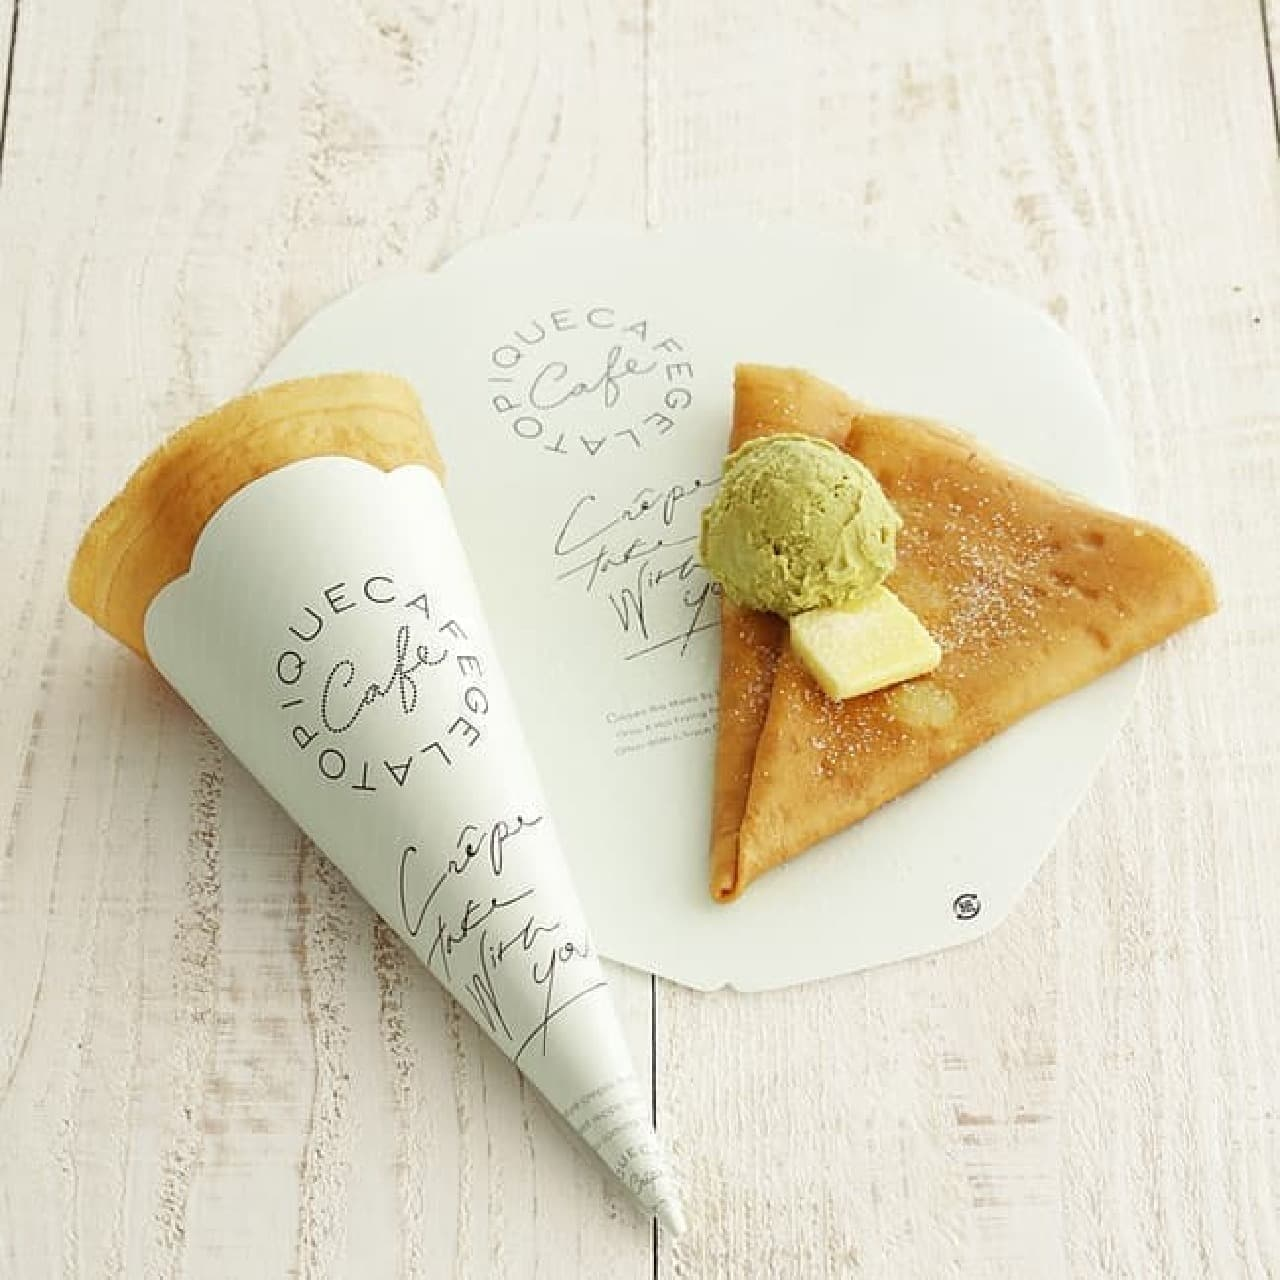 gelato pique cafeから限定ミニエコバッグ -- コンパクトに持ち運び